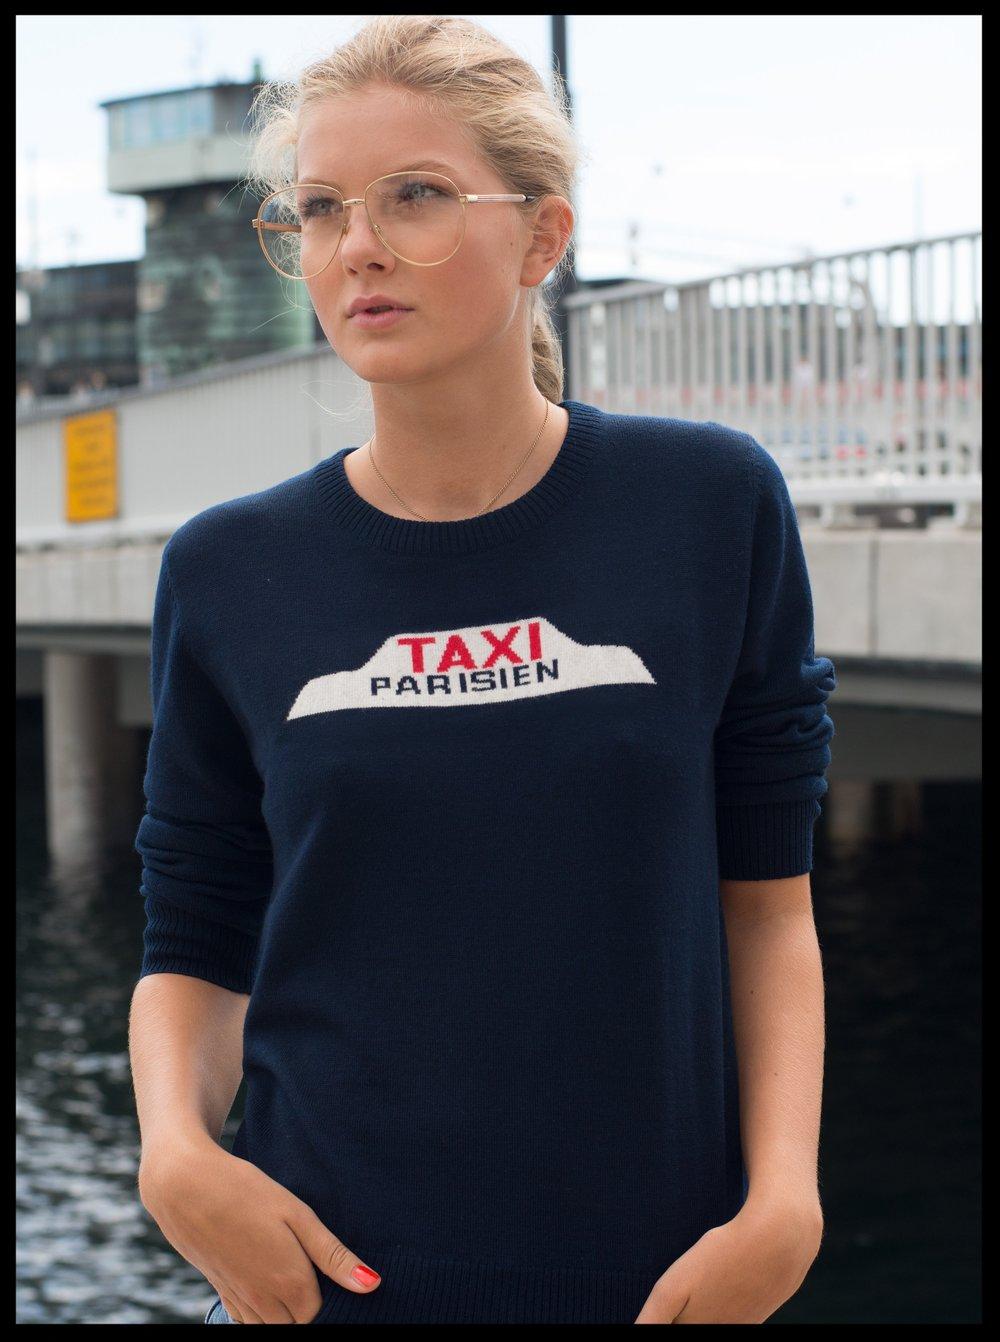 Taxi Parisien Sweater